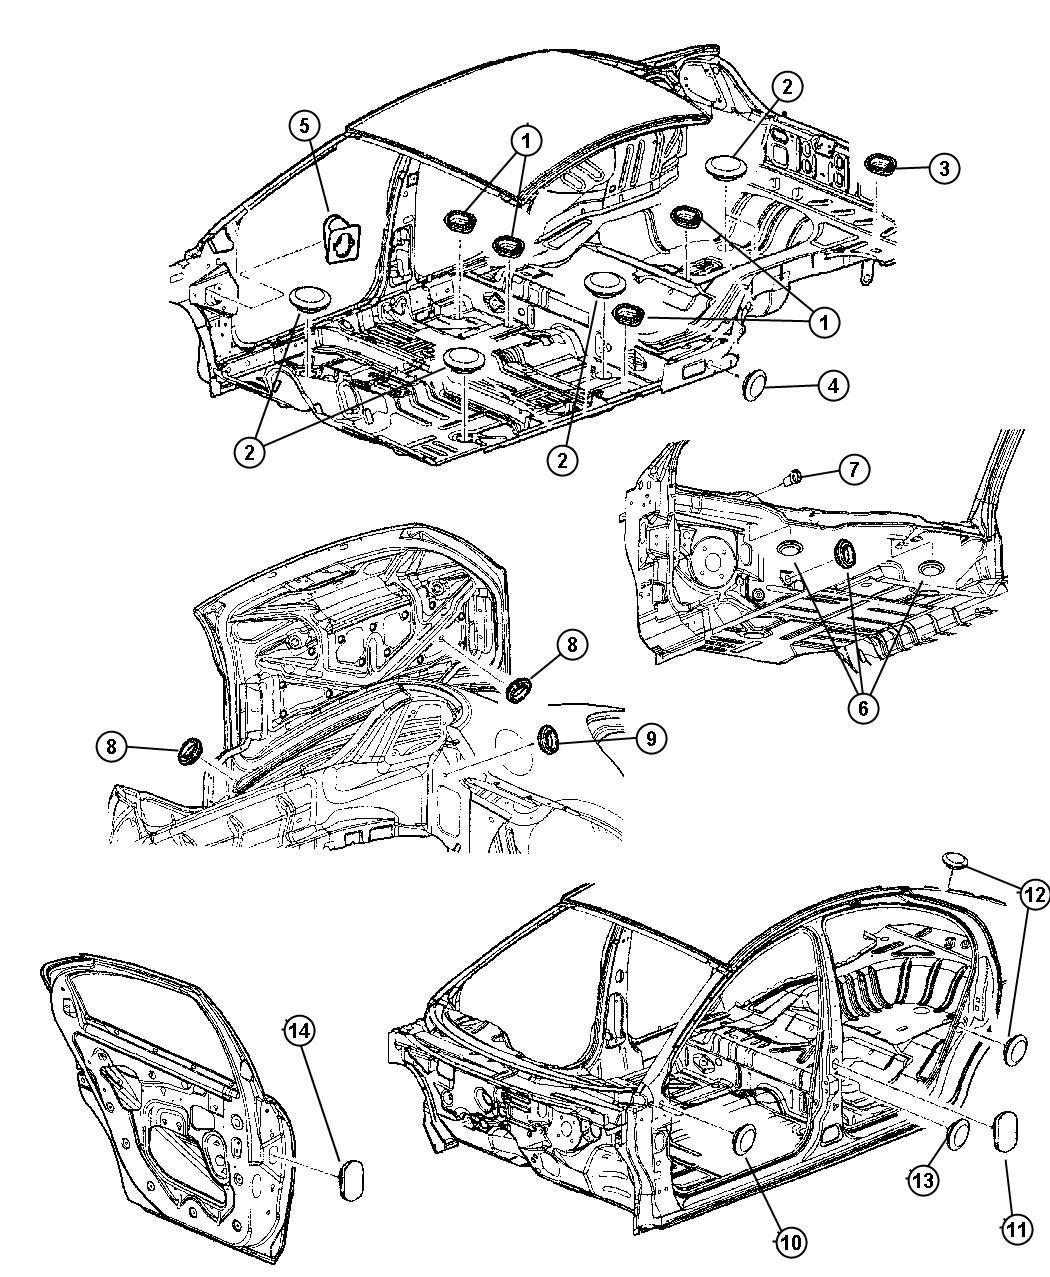 Chrysler 300 Plug Floor Pan Front Frt Flr Pan Man Shift